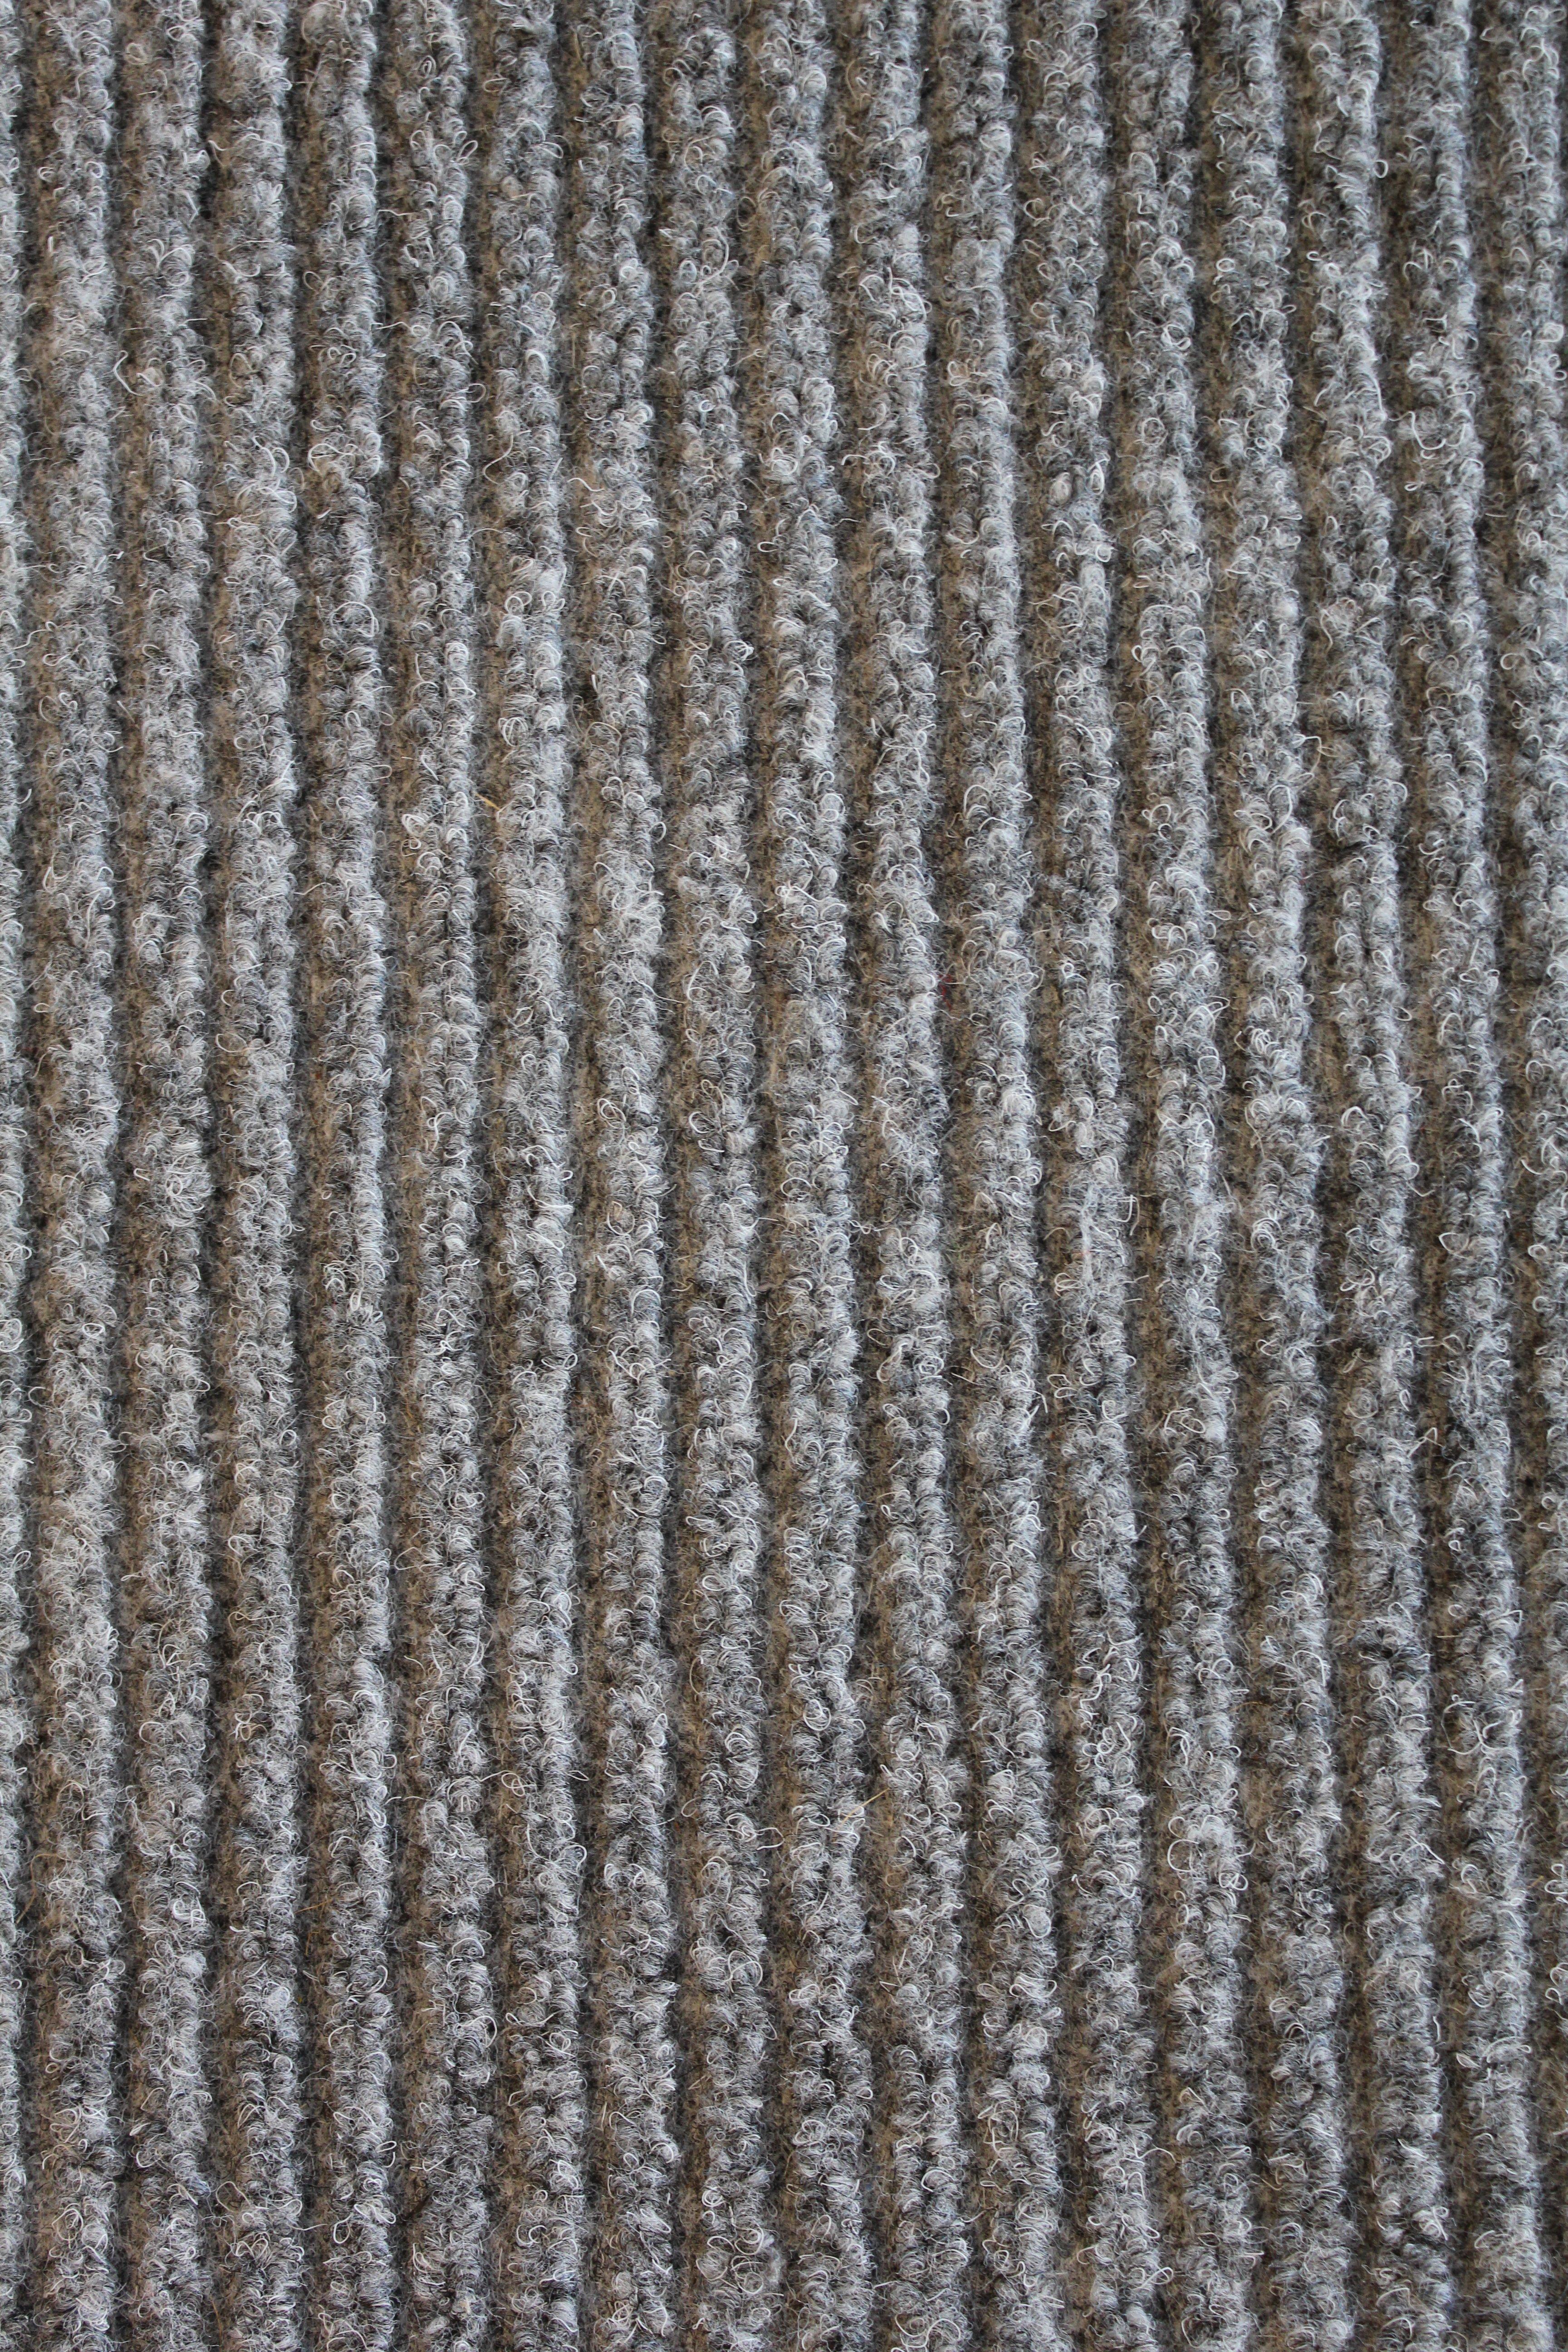 Ønsker tilbud på teppelegging av tretrapp (ca 15 trinn inkl. avsats)